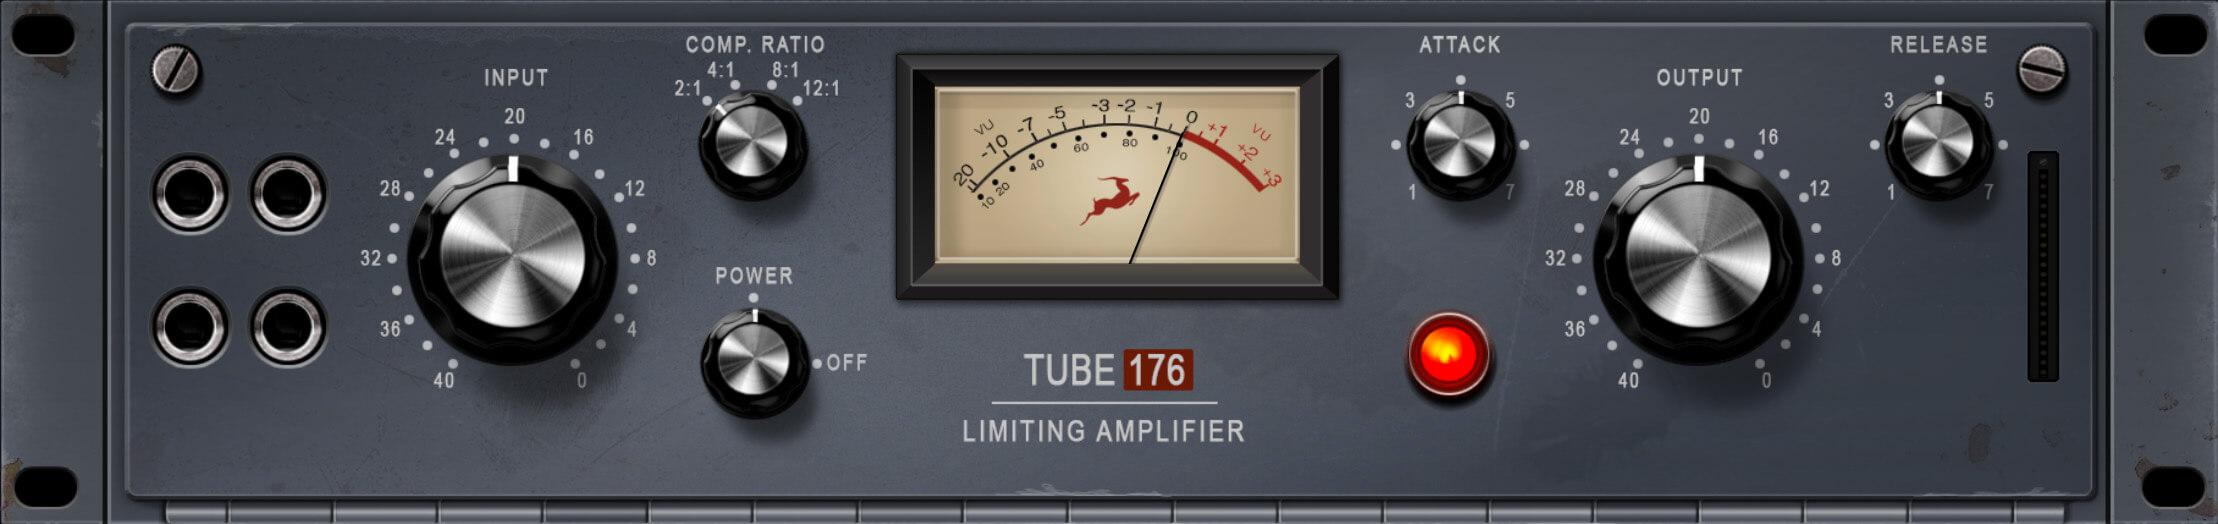 TUBE176